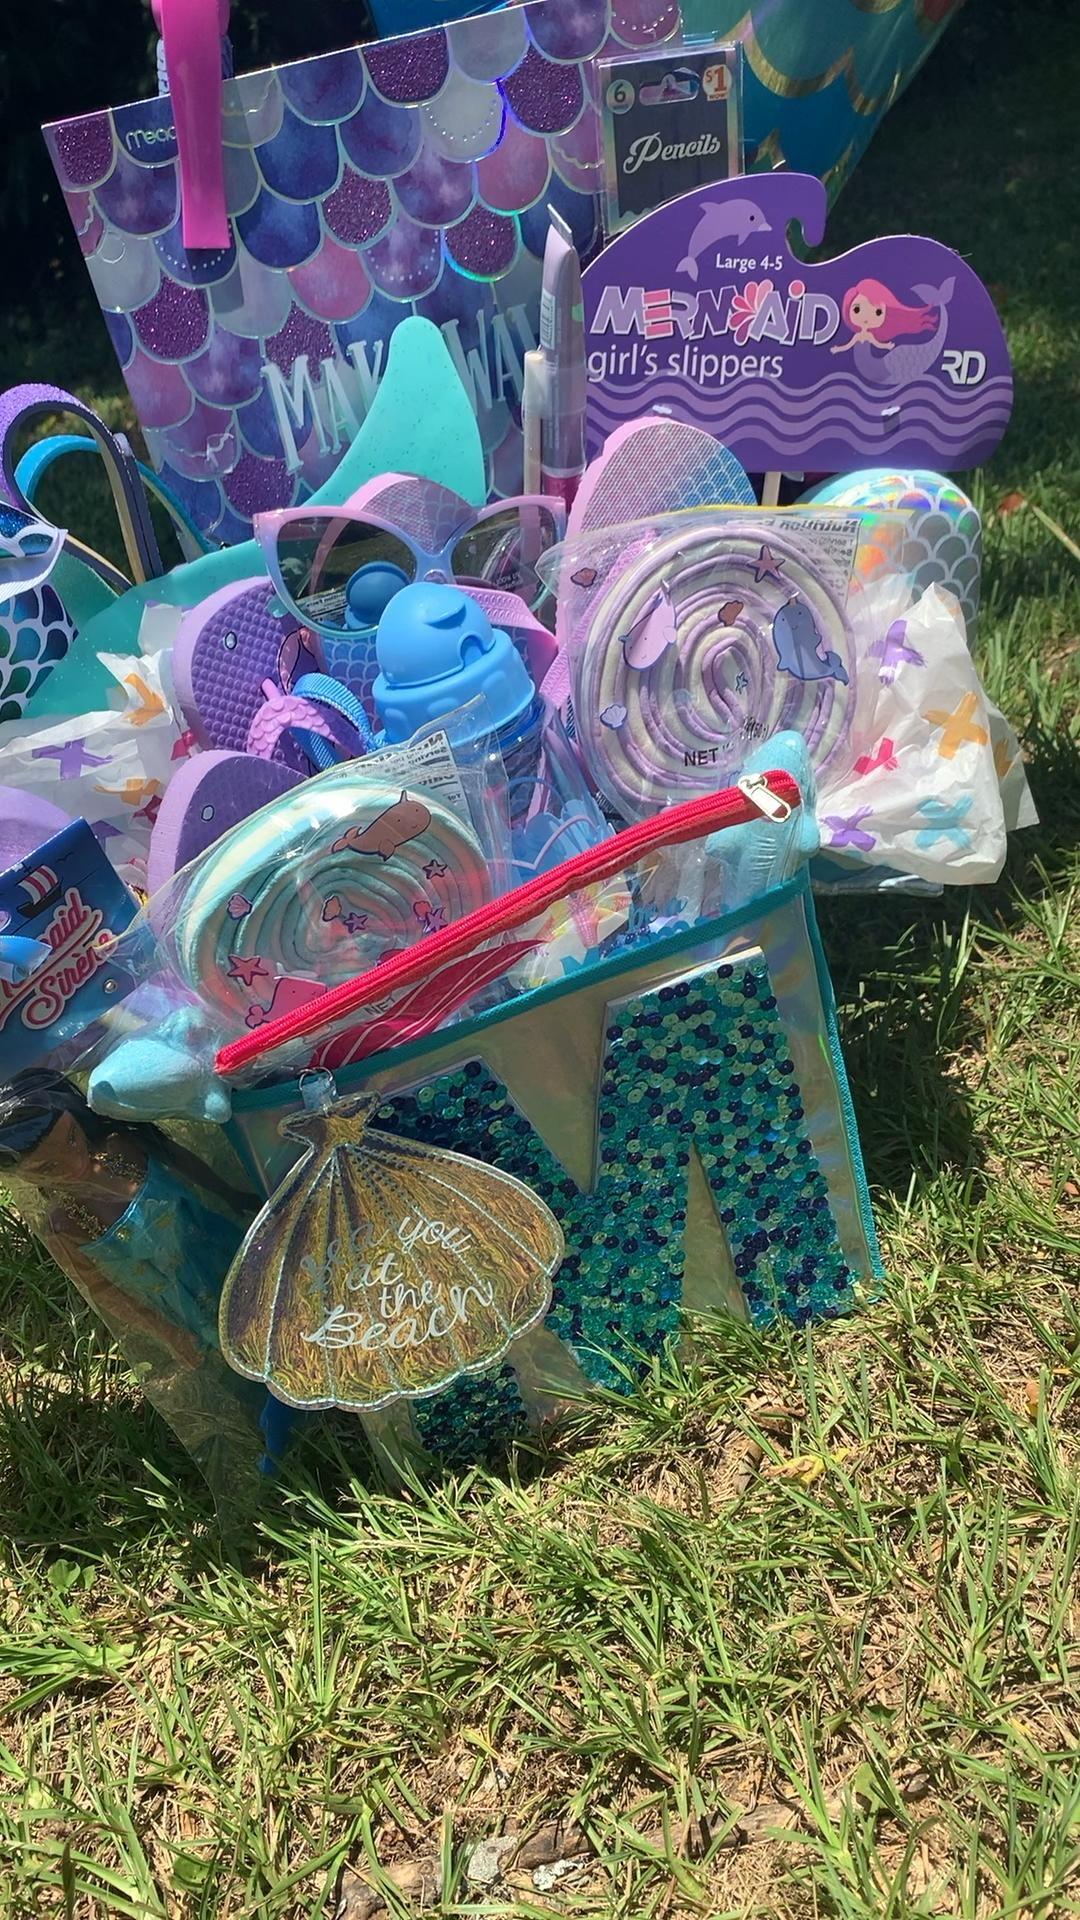 #mermaid #madebyme #zhle #diy #custom #customgiftbasket #customgift #mermaidparty